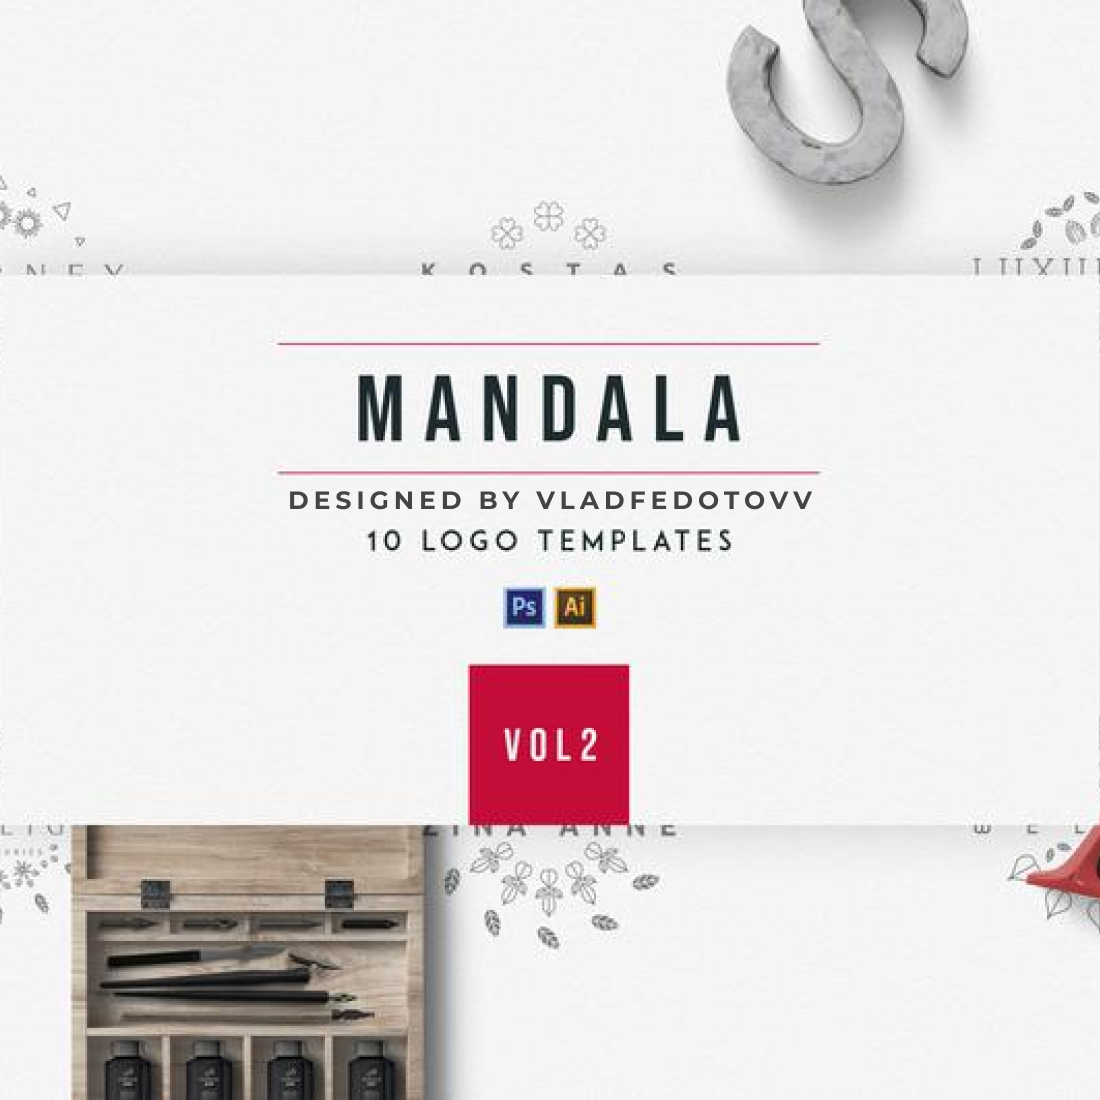 Mandala Logo Creator Mandala 10 Logo Templates cover image.